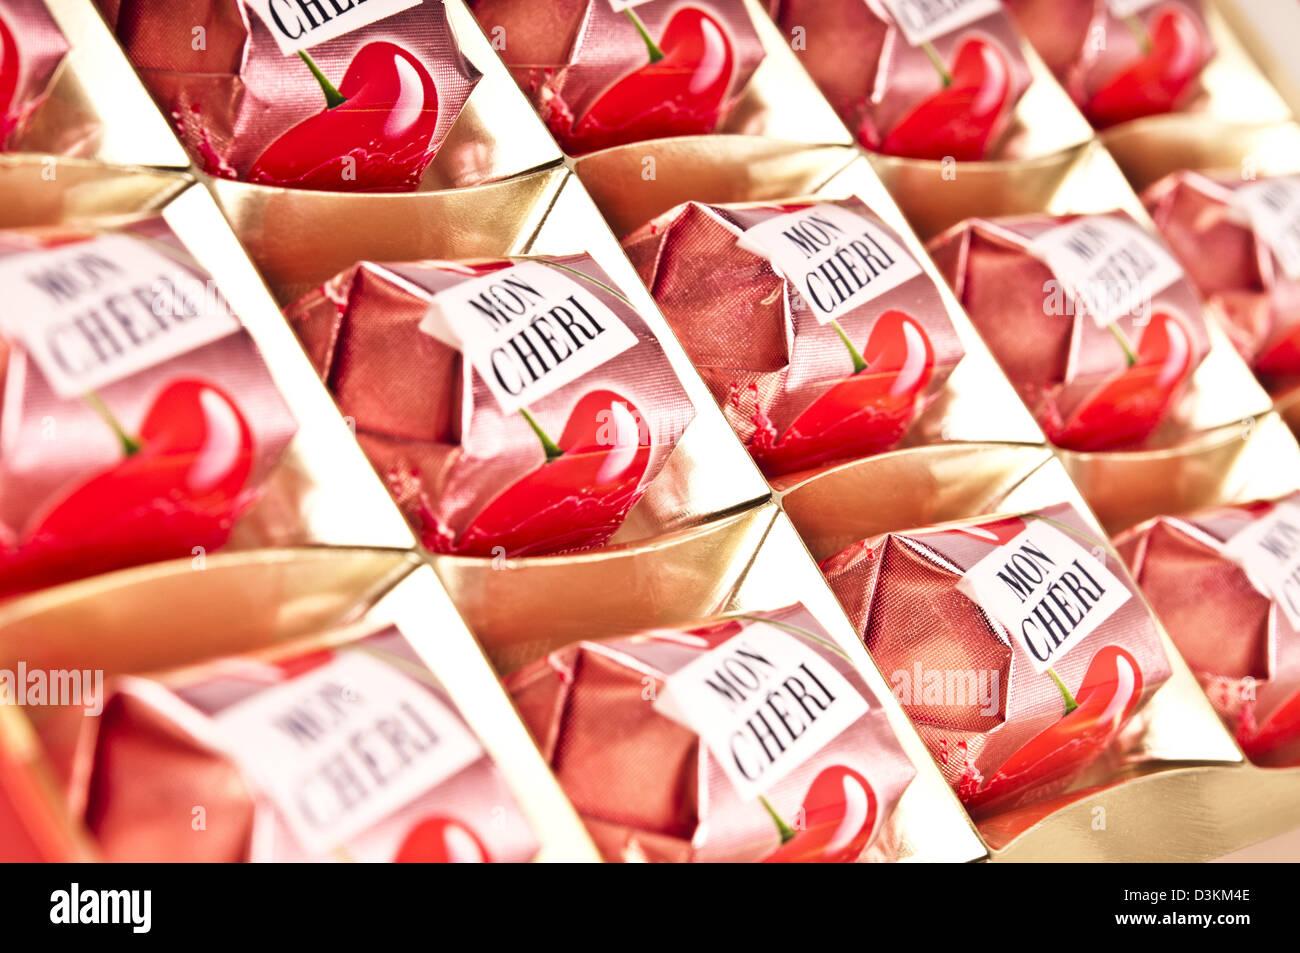 box of Mon Cheri chocolate bonbons Stock Photo, Royalty Free Image ...